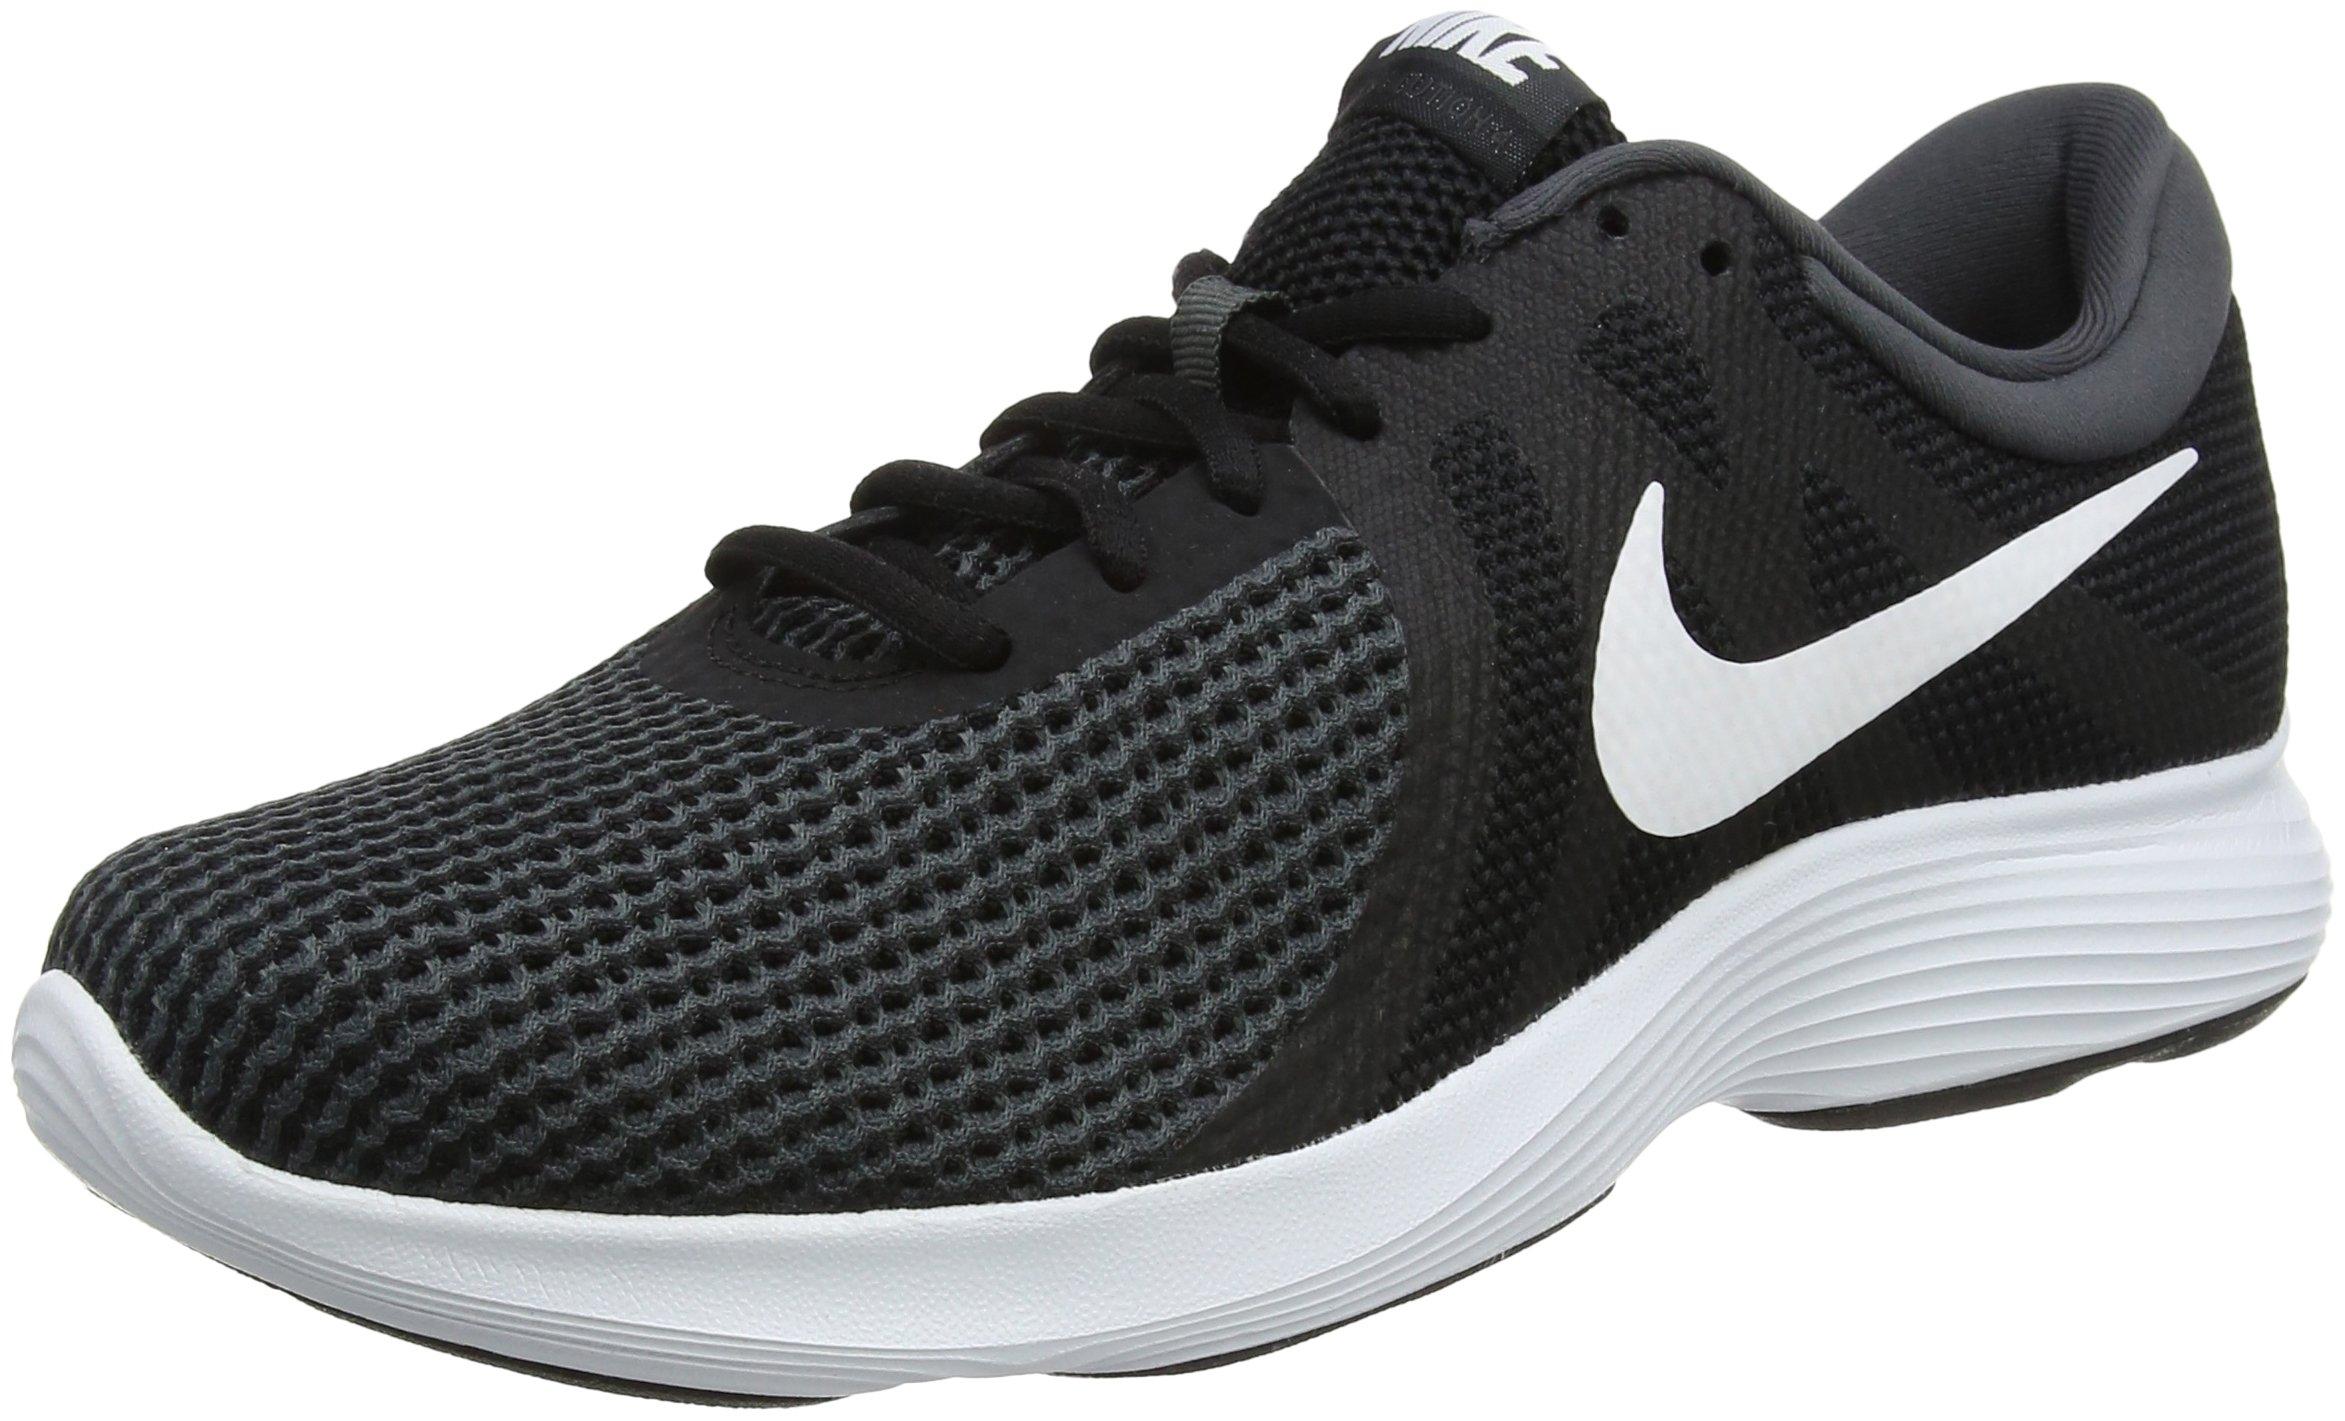 buy online c7427 75880 Nike REVOLUTION 4 EU, Scarpe da corsa Uomo product image